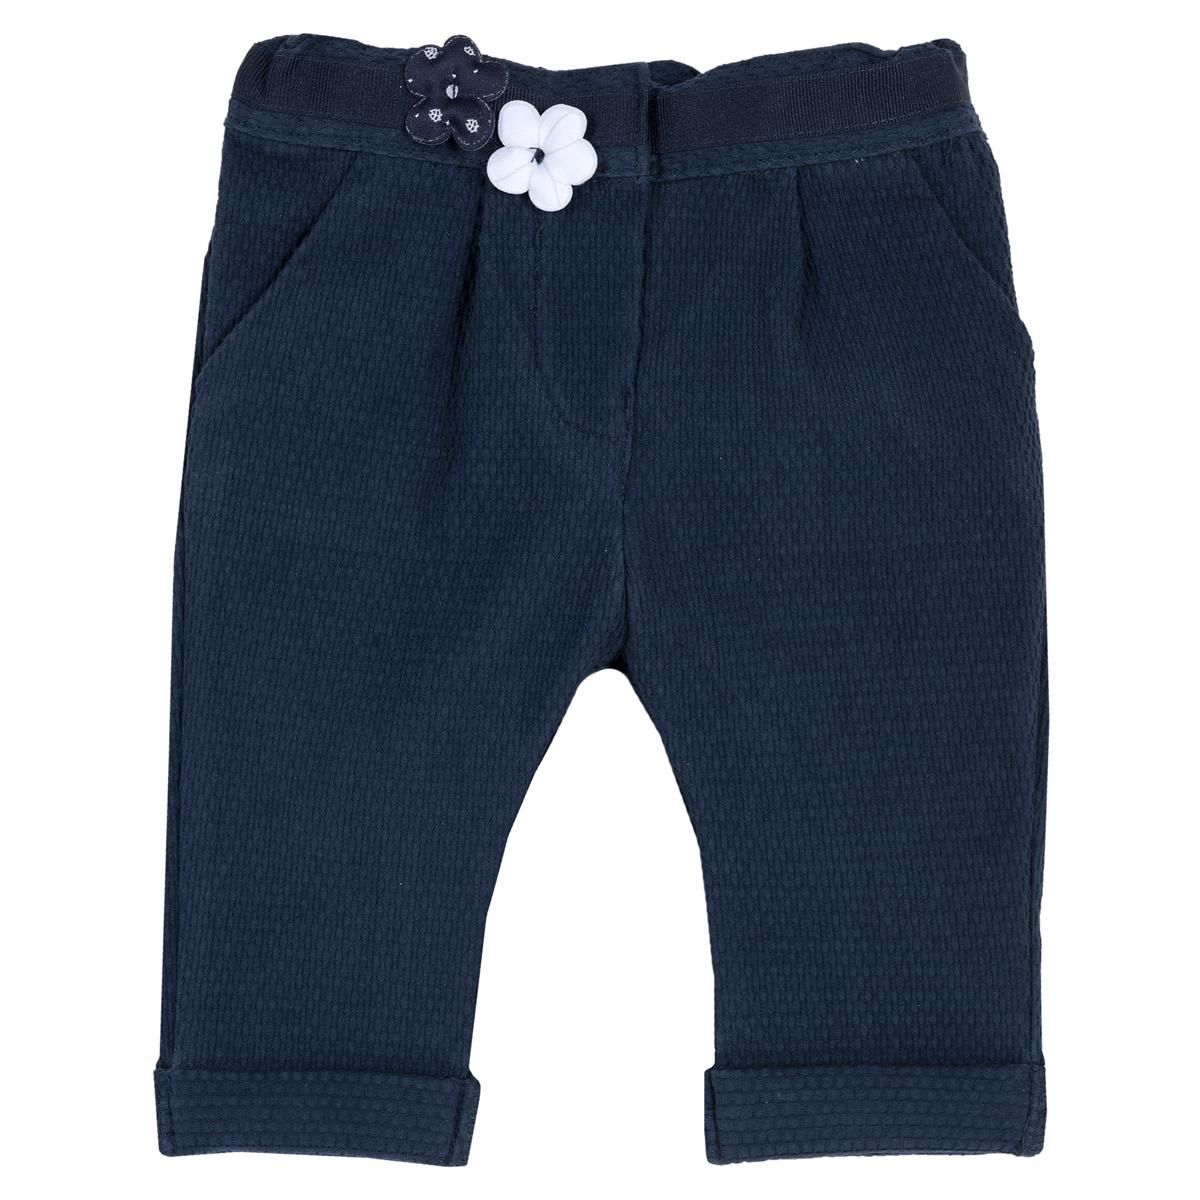 Pantalon lung copii Chicco, albastru inchis, 24918 din categoria Pantaloni copii